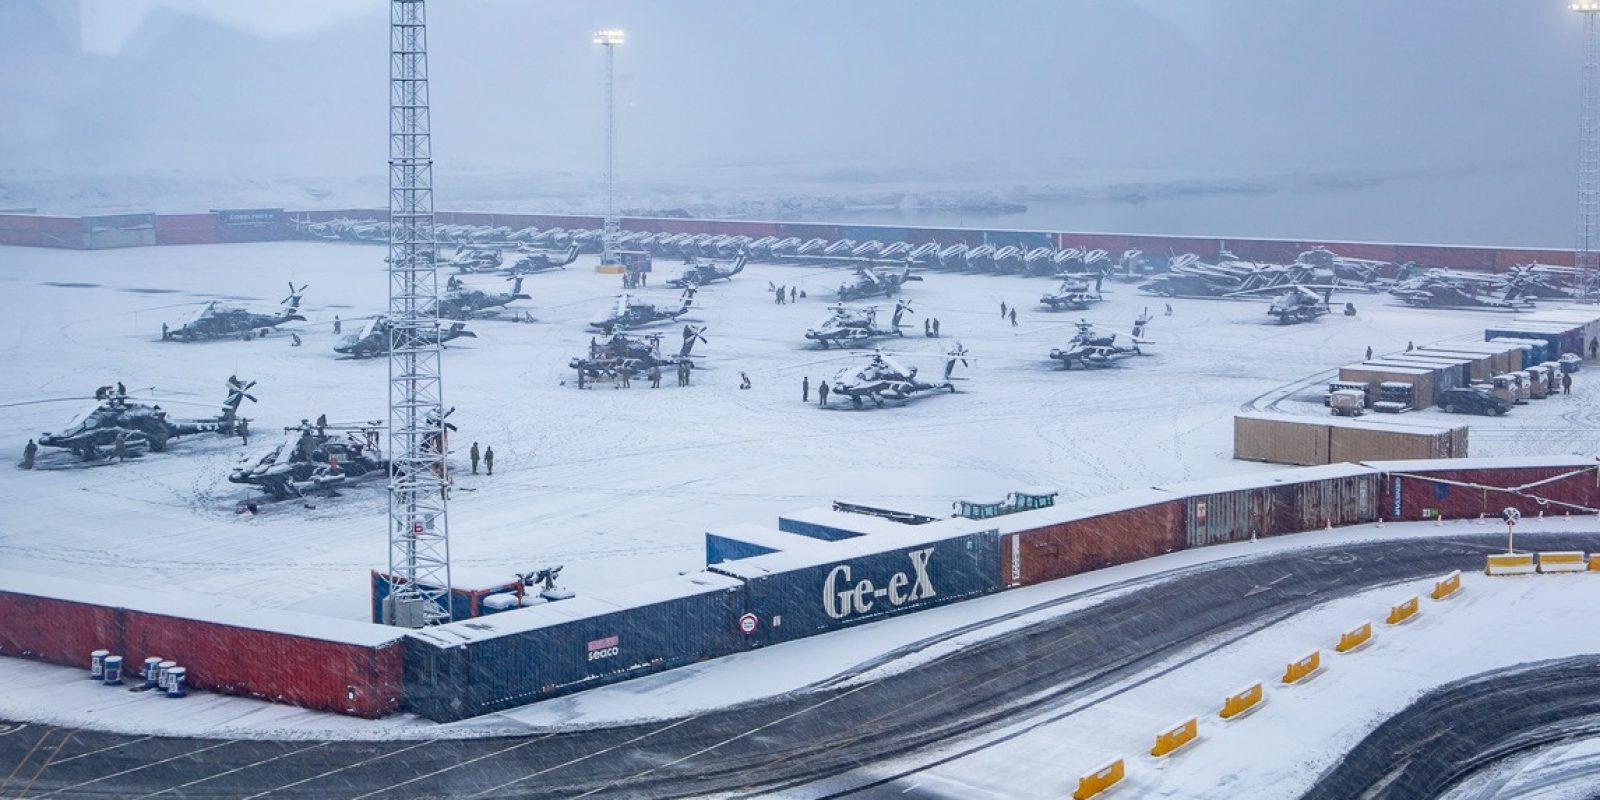 ZEEBRUGGE - Amerikaanse Landmacht komt aan in Zeebrugge voor Atlantic Resolve. (Foto Tom - www.fototom.be)